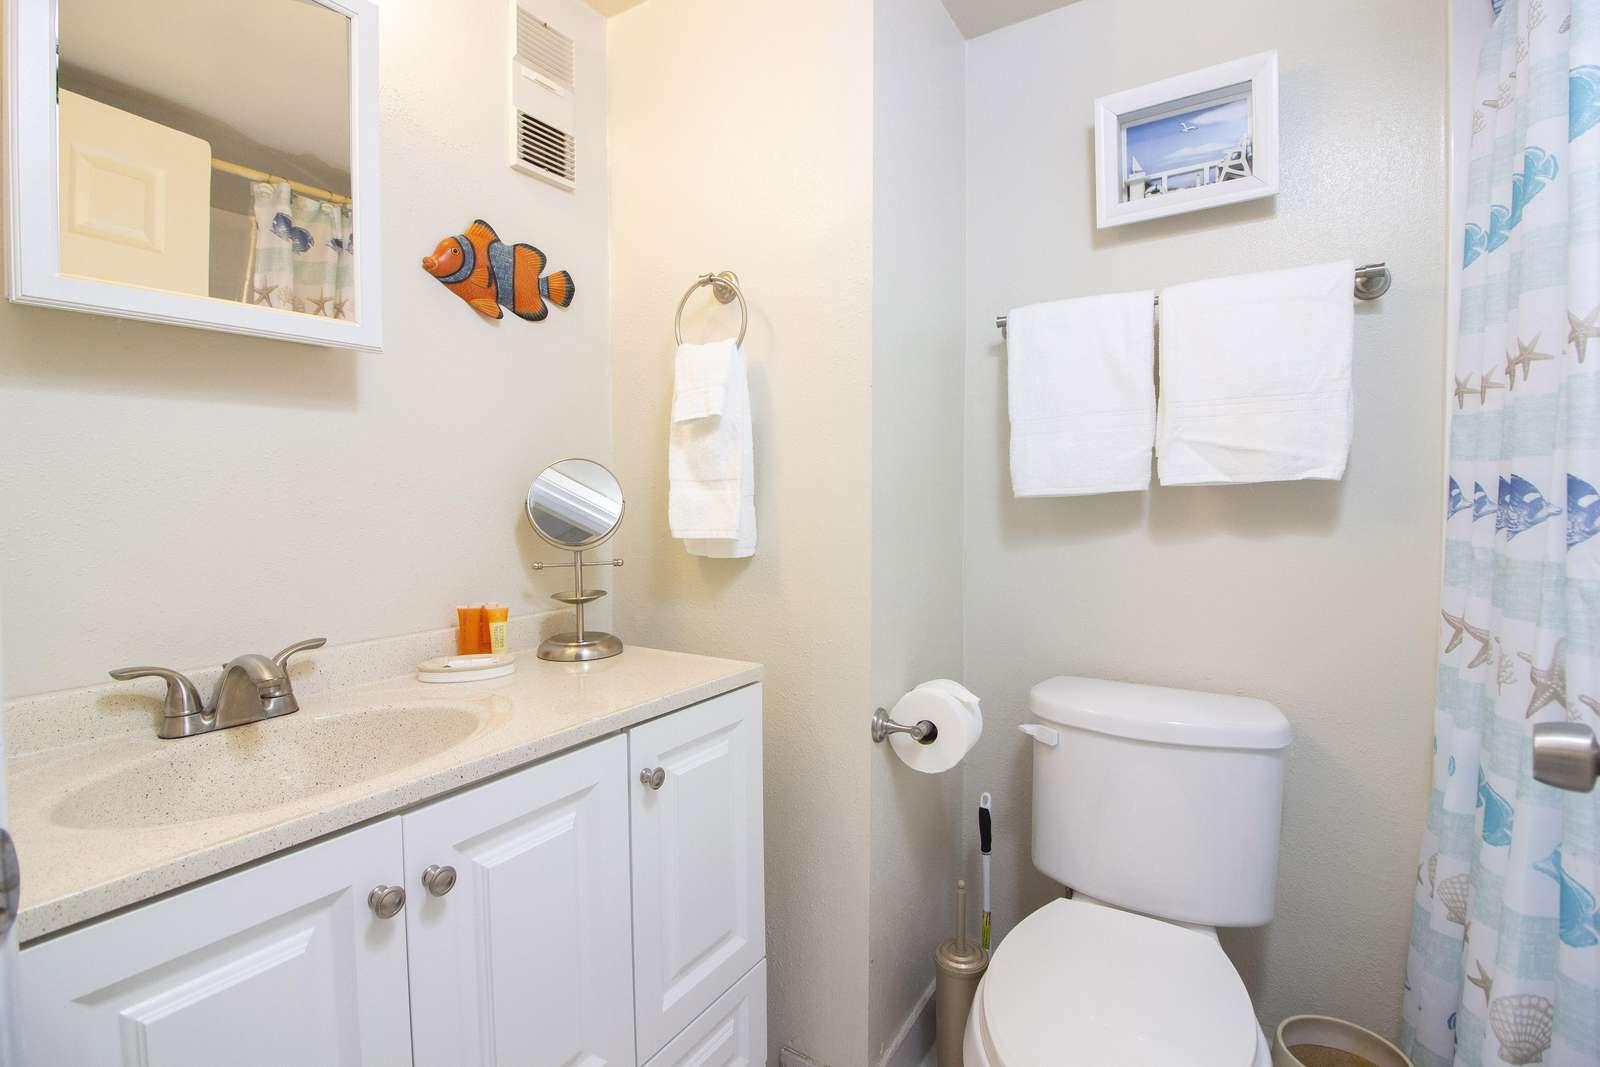 Bathroom - Tub/Shower Combo